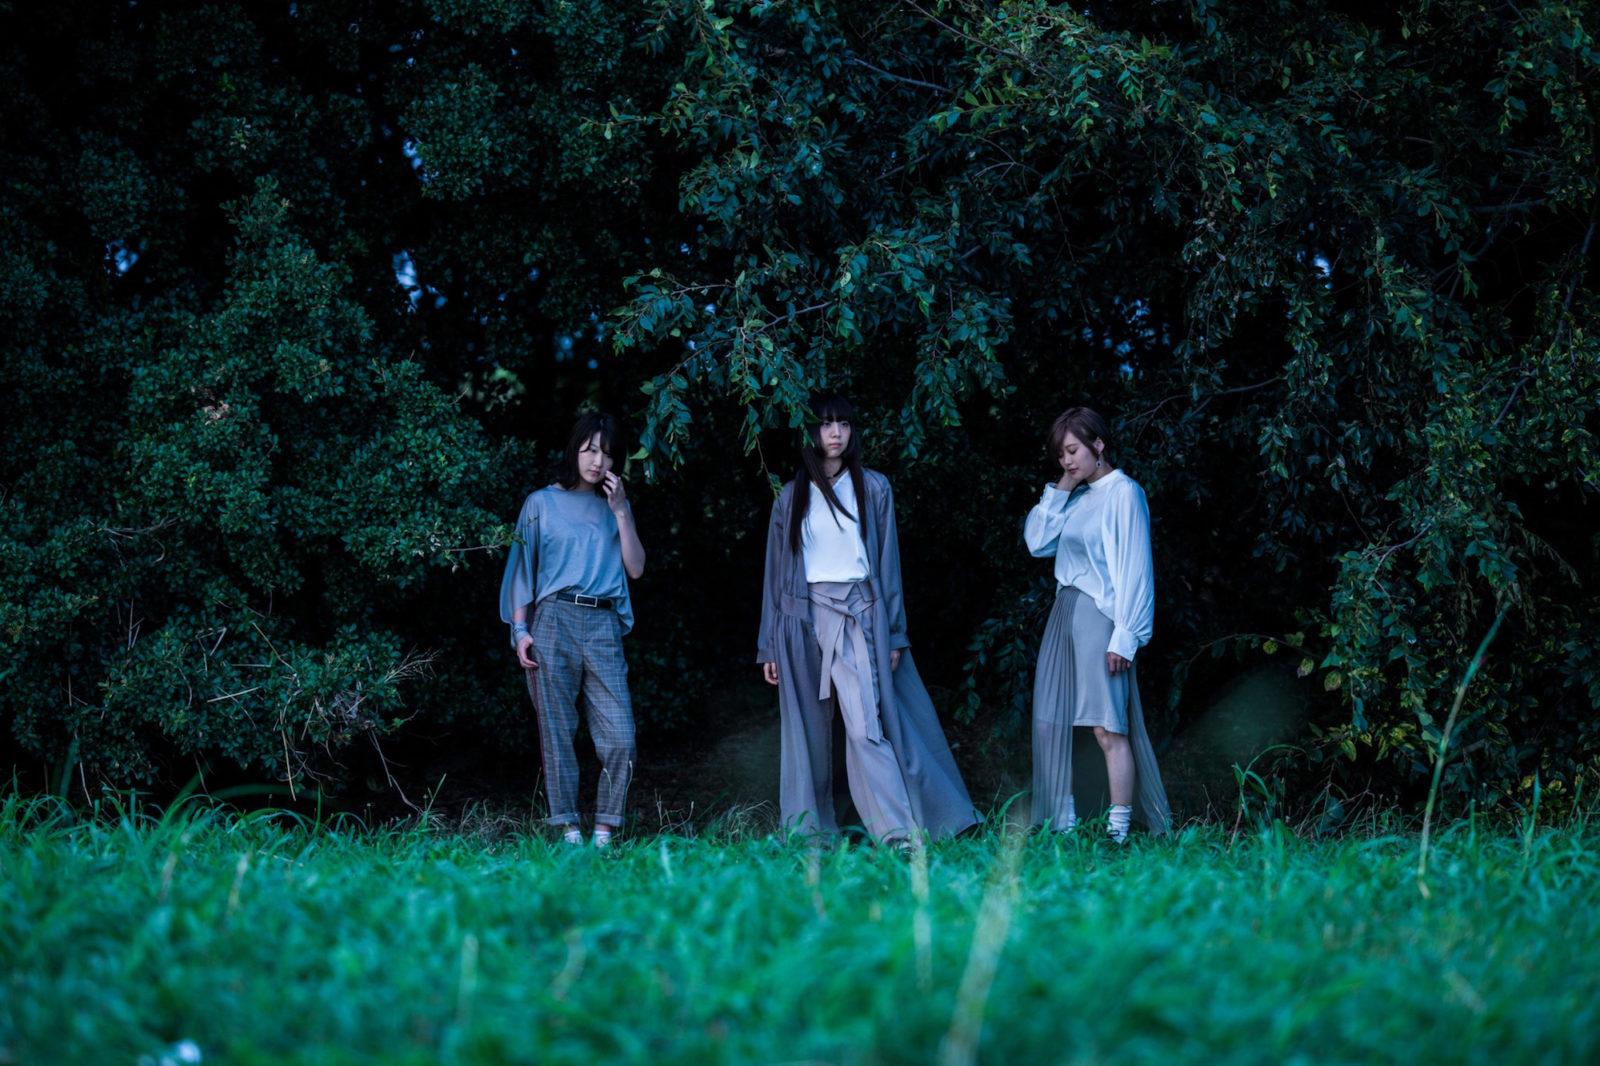 ELFiN PLANET、1stミニアルバム発売に伴いアルバムから収録曲「サテライト・サーチライト」のMVを公開サムネイル画像